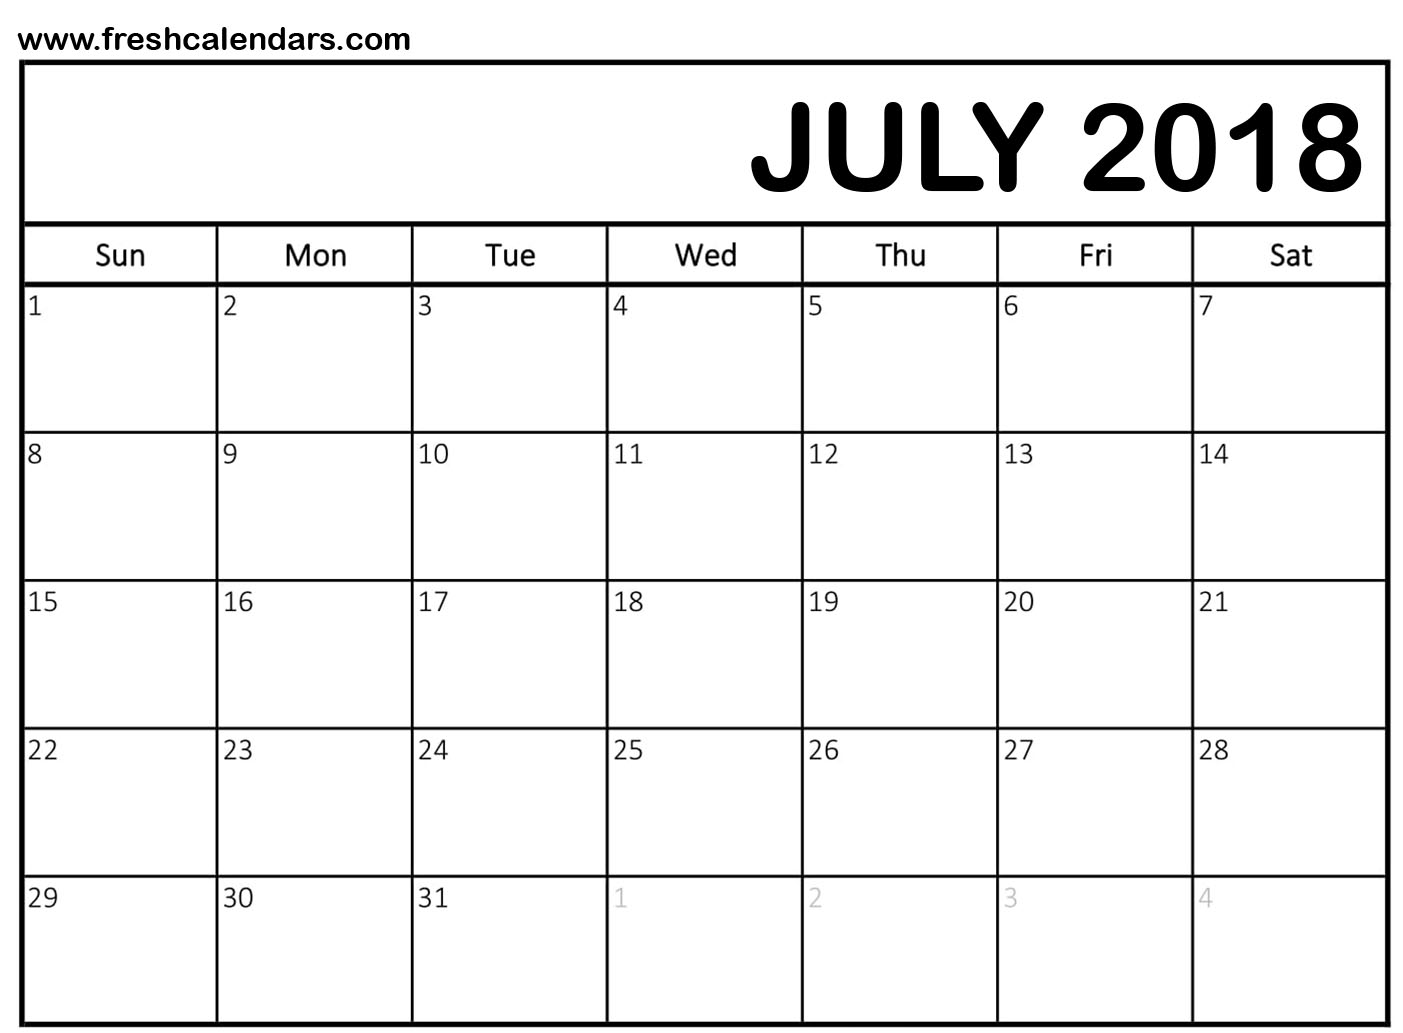 July 2018 Calendar Printable Templates